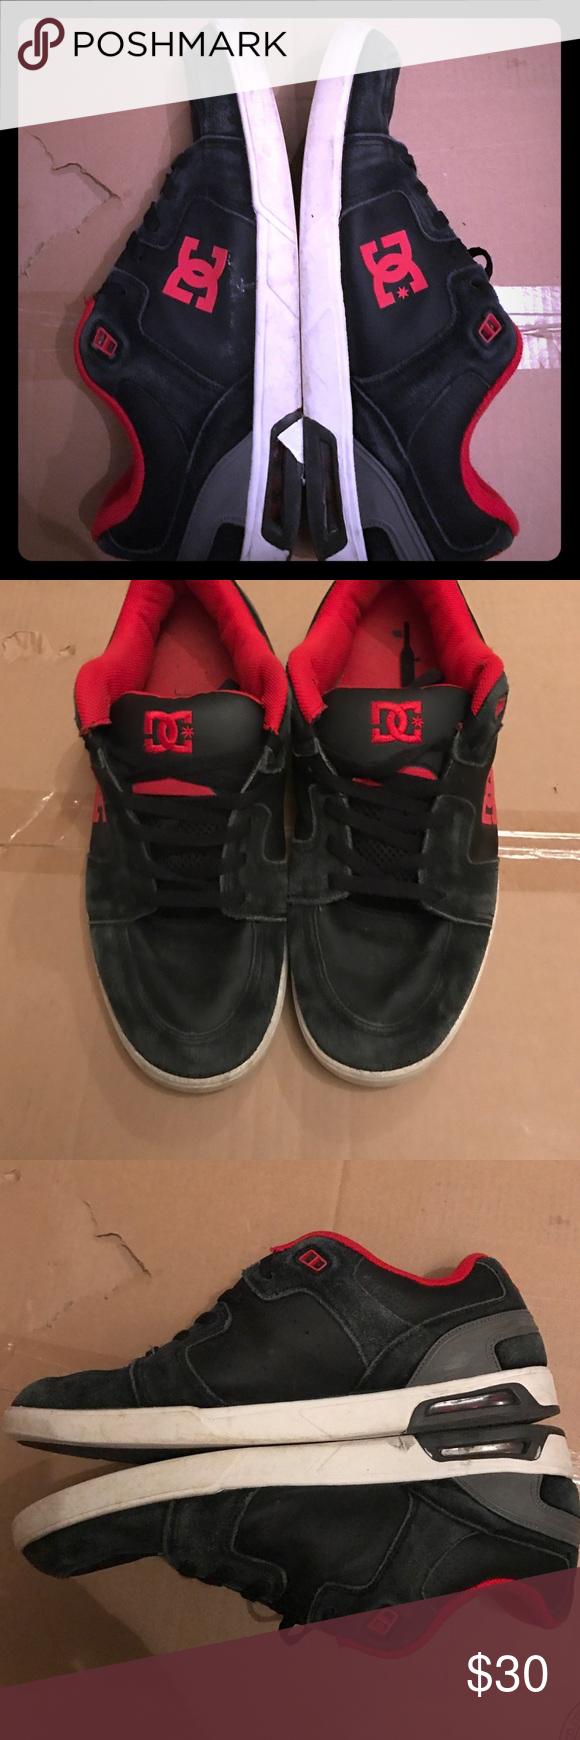 D.C. Skate sneakers Size 14, broken in